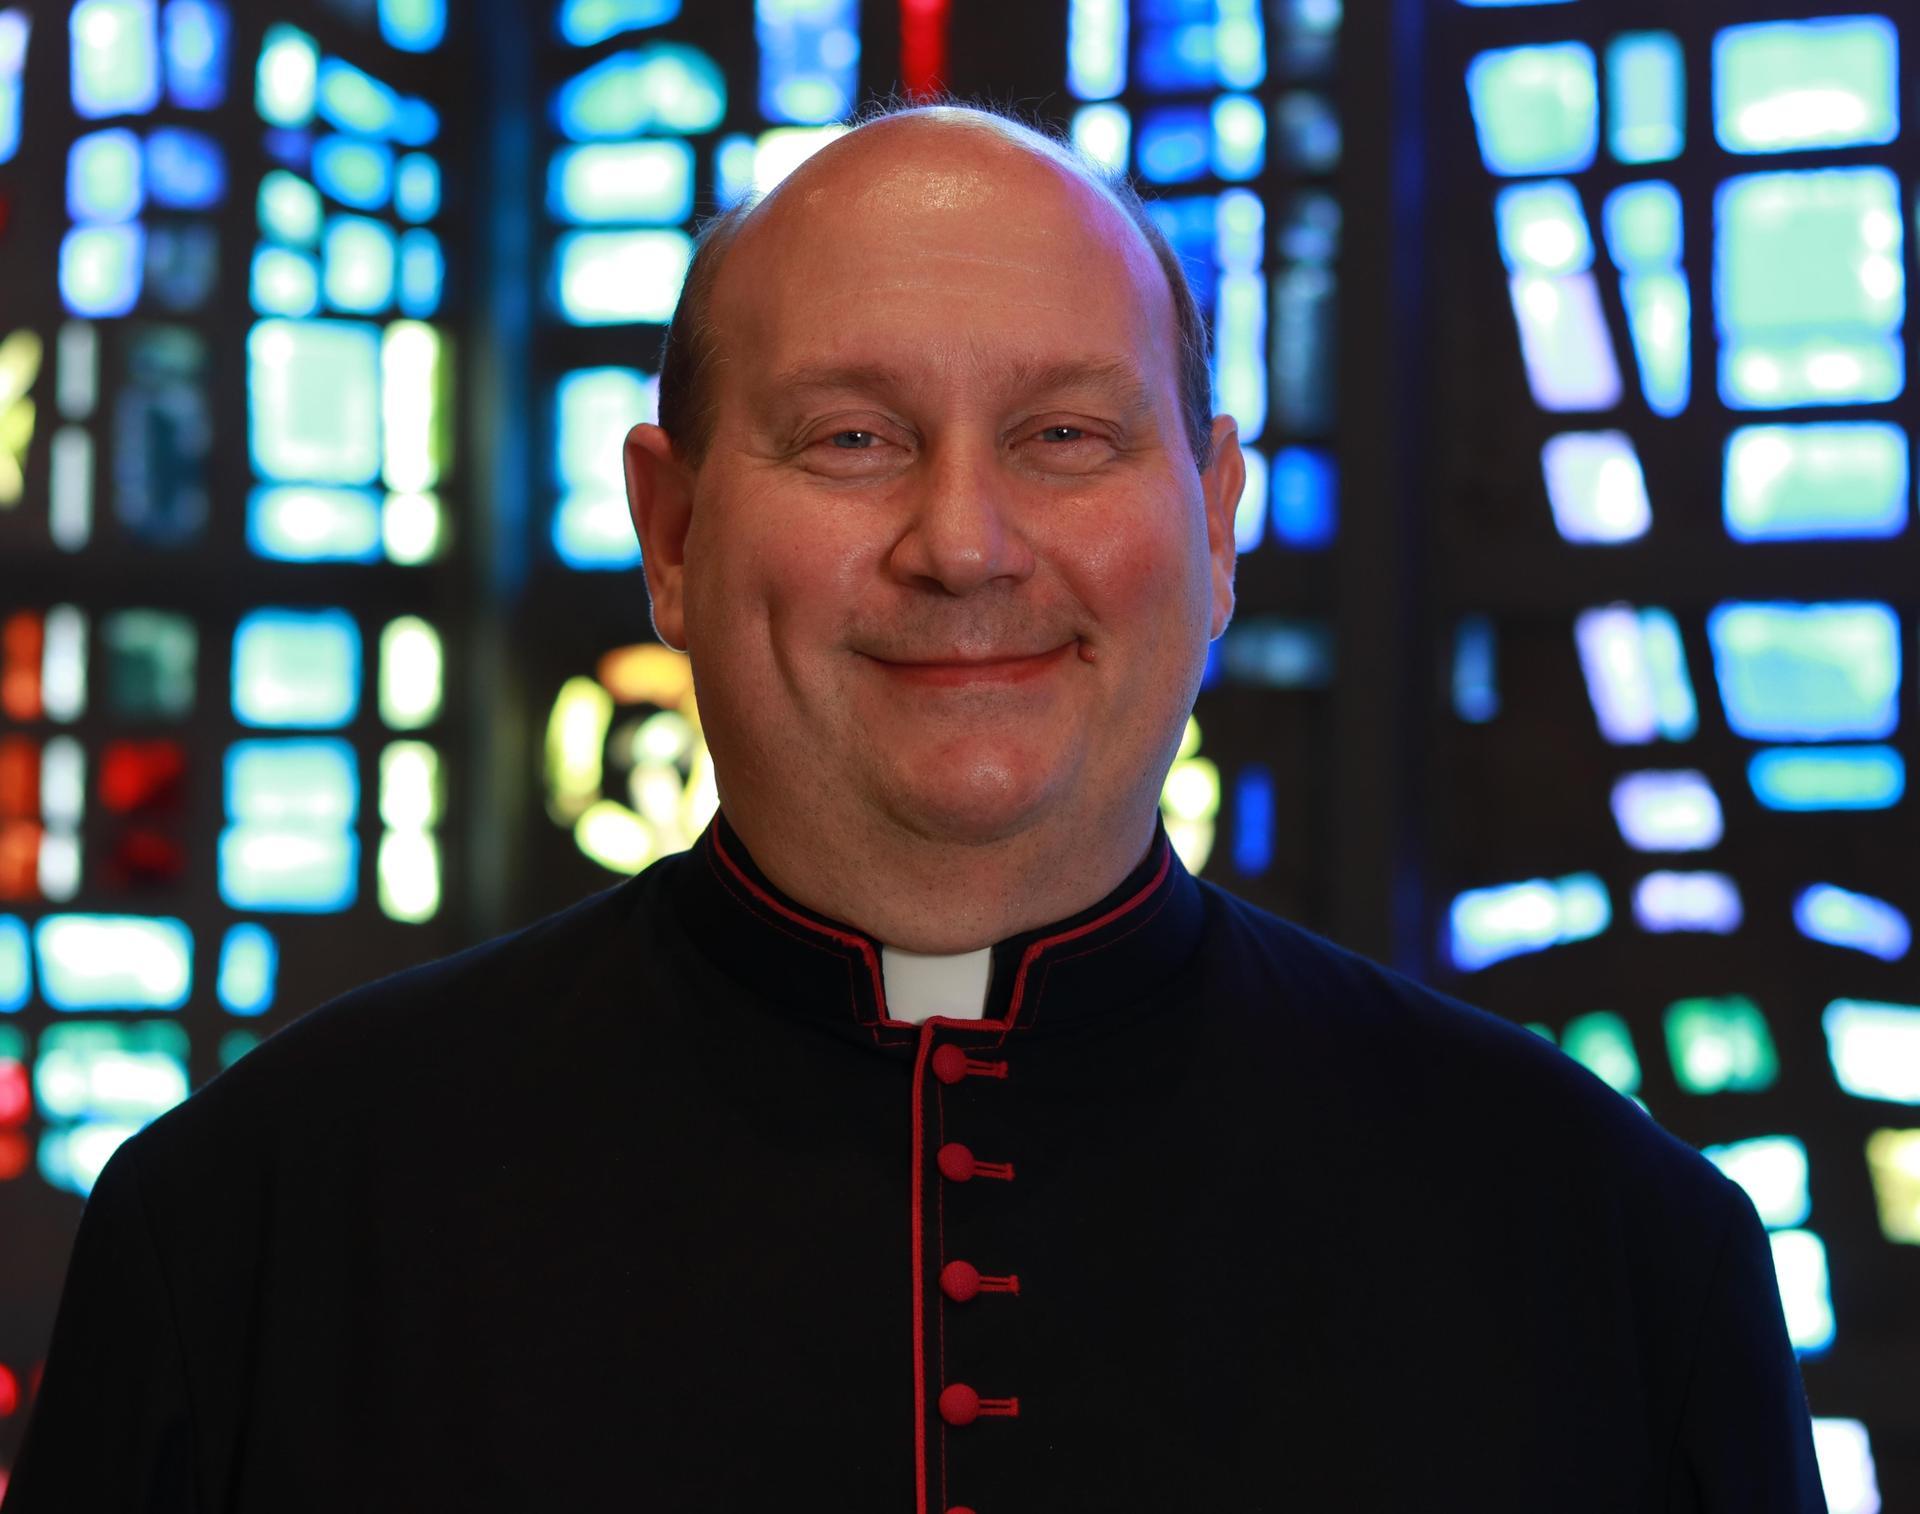 Fr. Walter Ptak